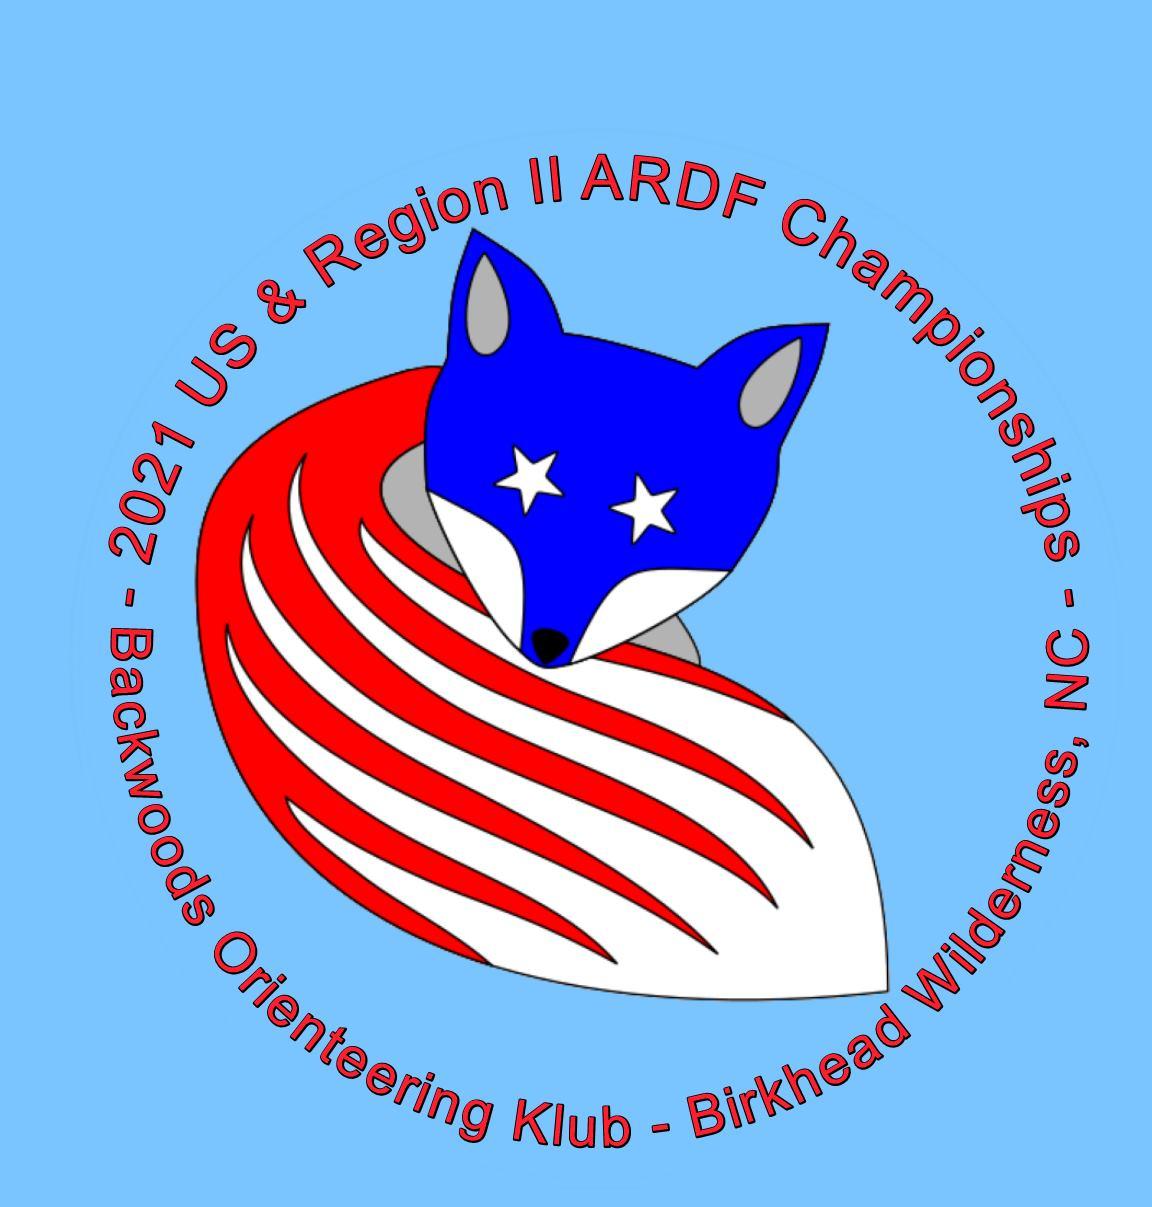 ARDF US & Region II Championships 2021